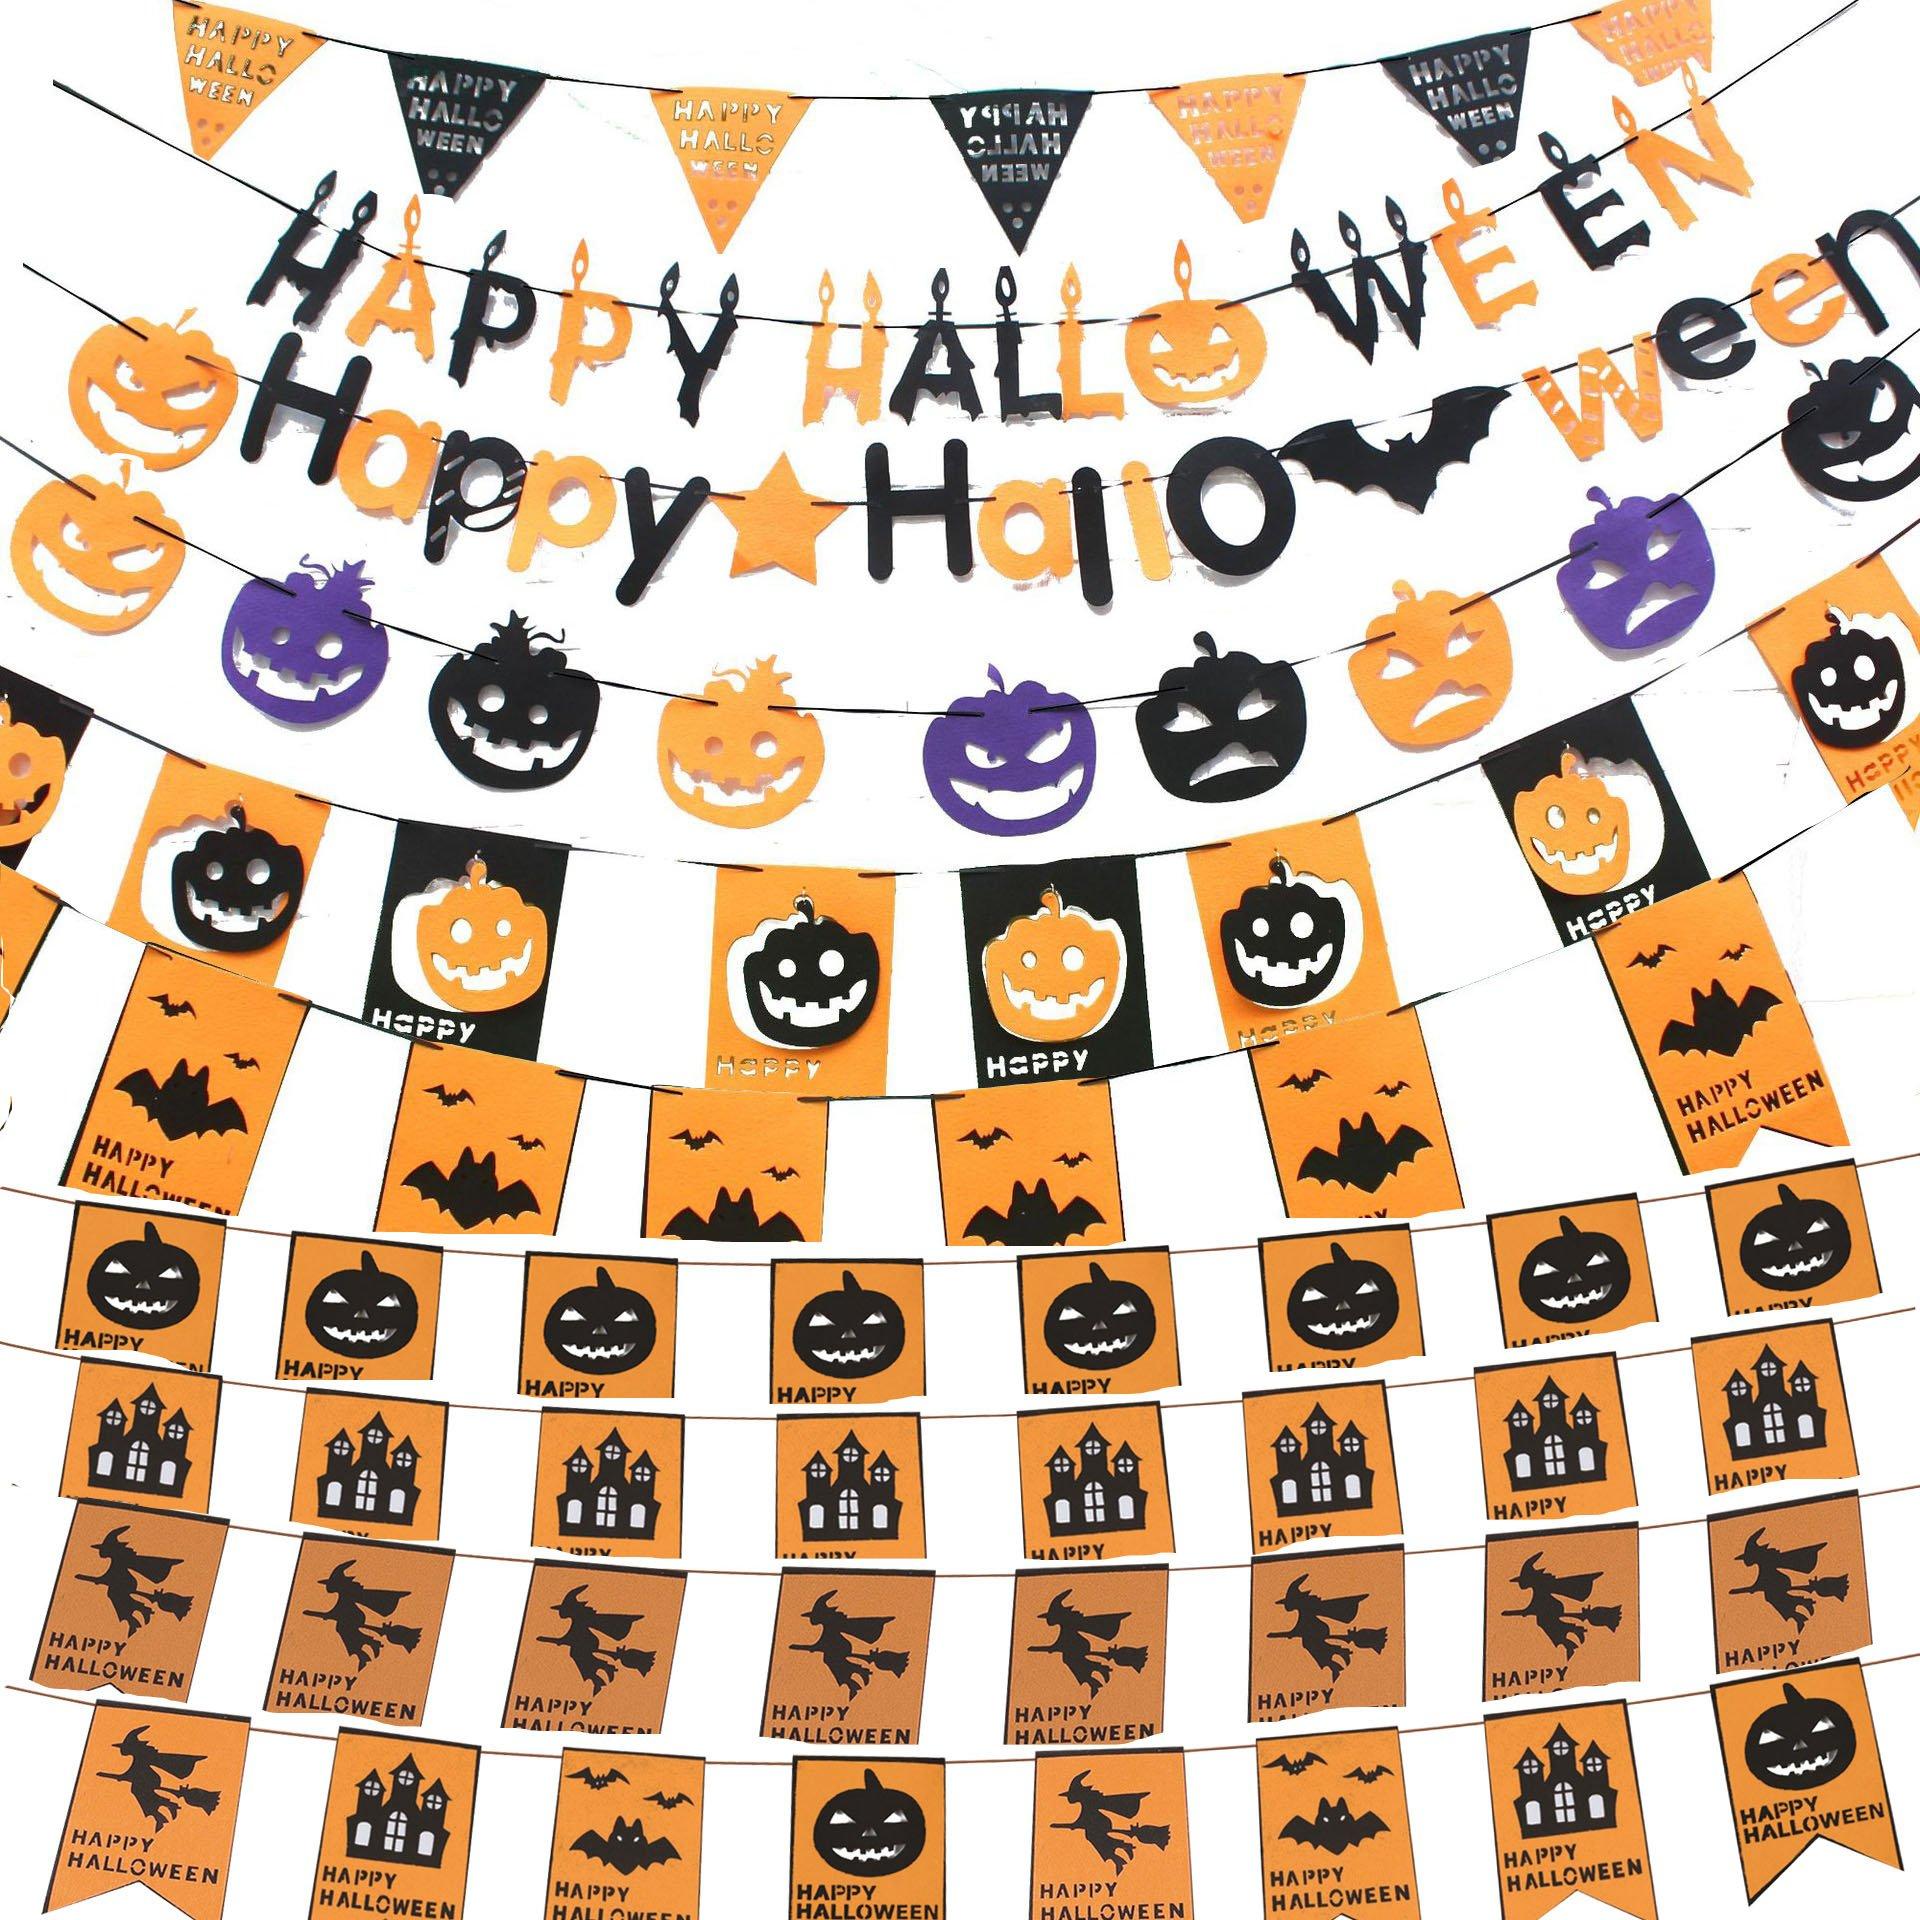 Happy Halloween Pumpkin Bat Wizard Swallowtail Pennant Party Banners School Hotel Decoration 10pcs